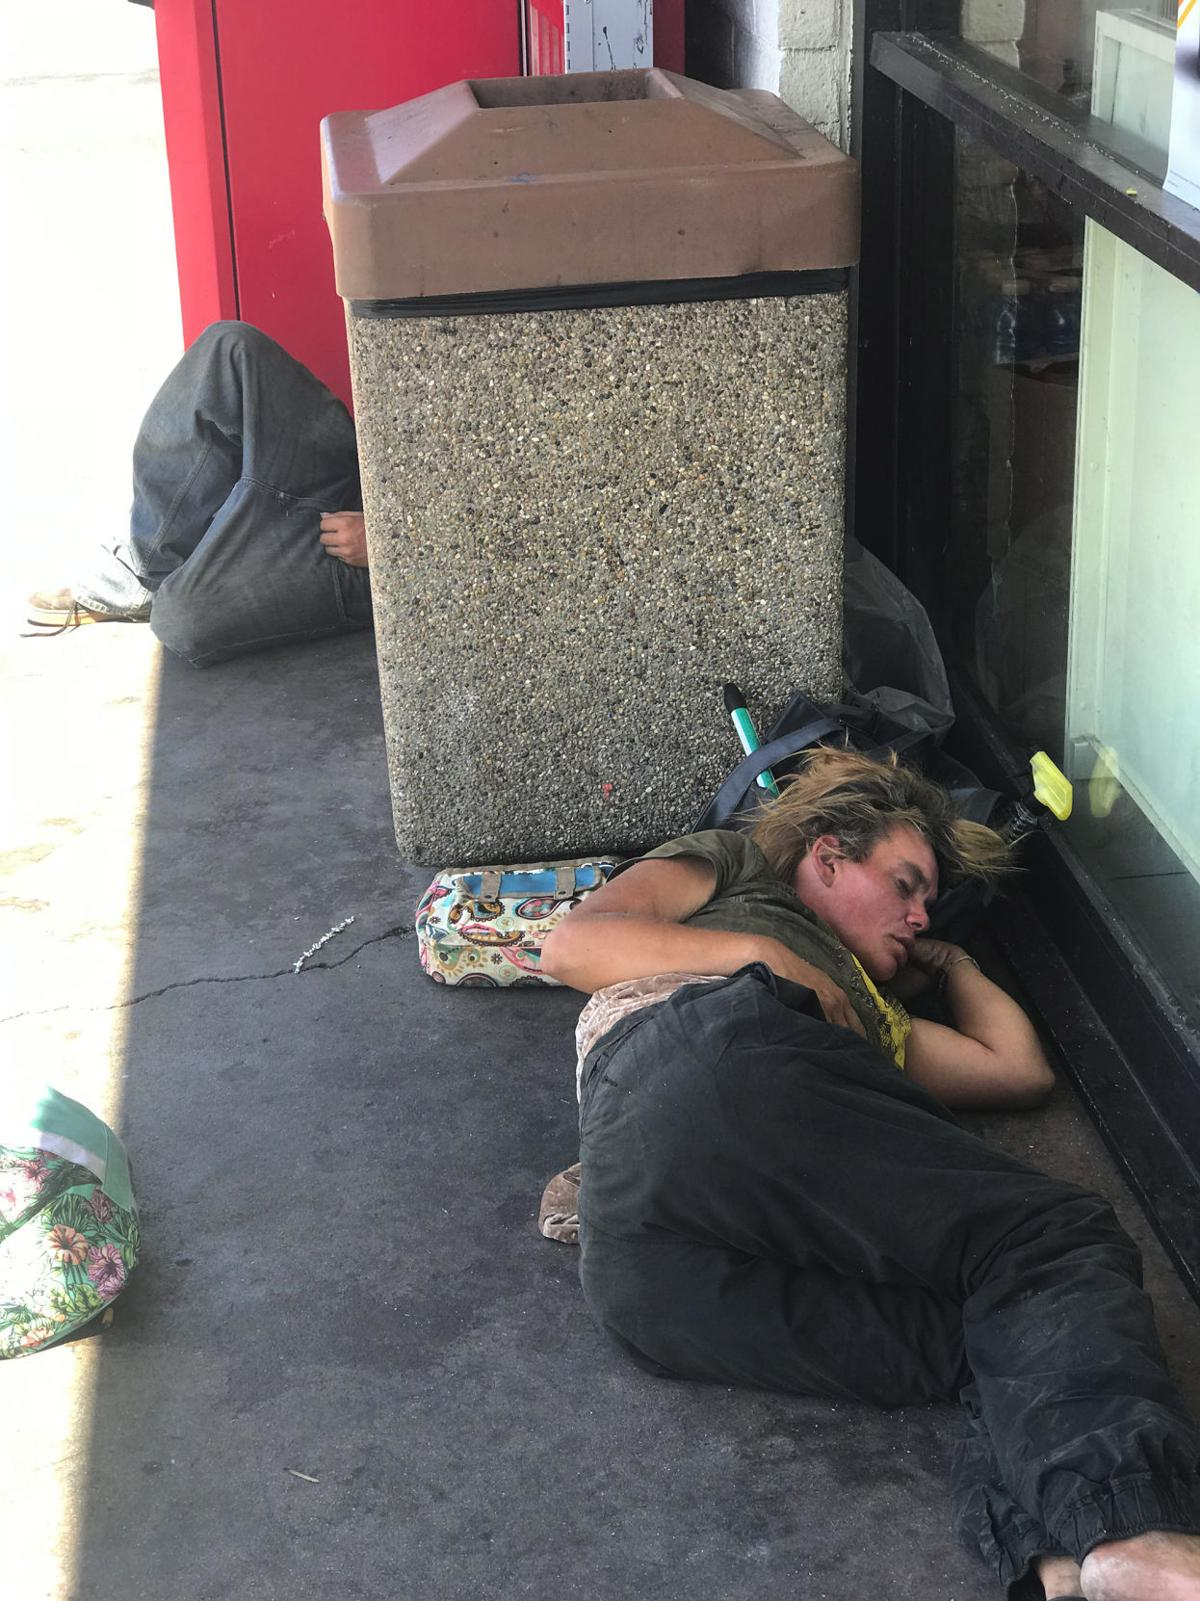 7-Eleven sleeper